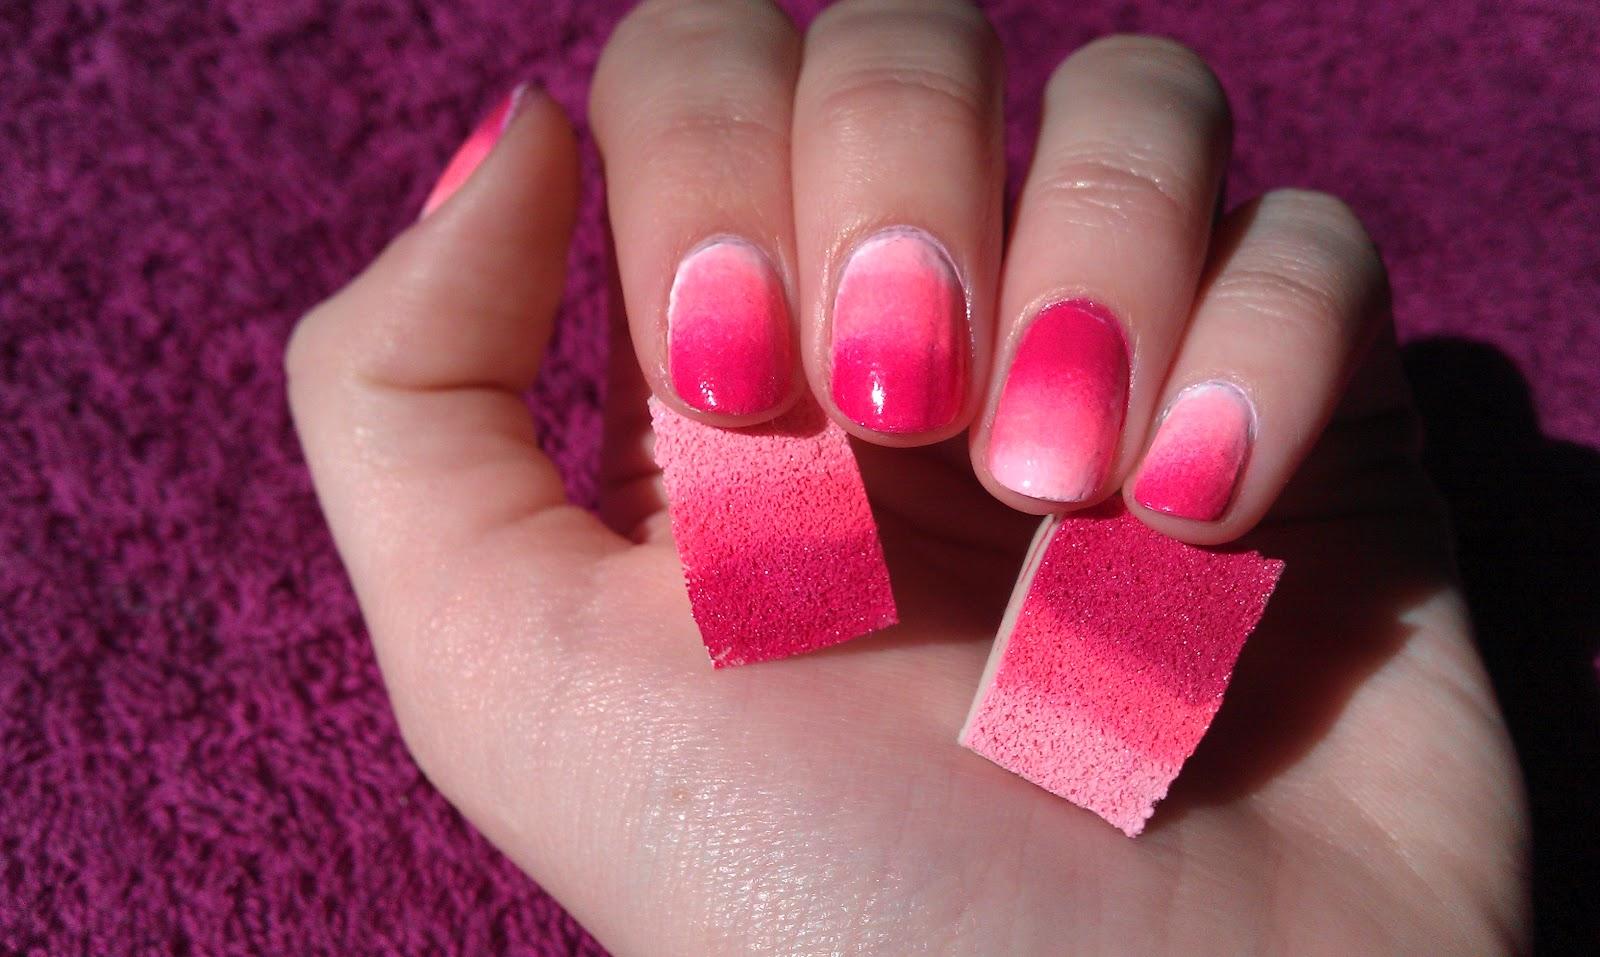 Miss claira bella video tutorial ombre nail art video tutorial ombre nail art prinsesfo Image collections